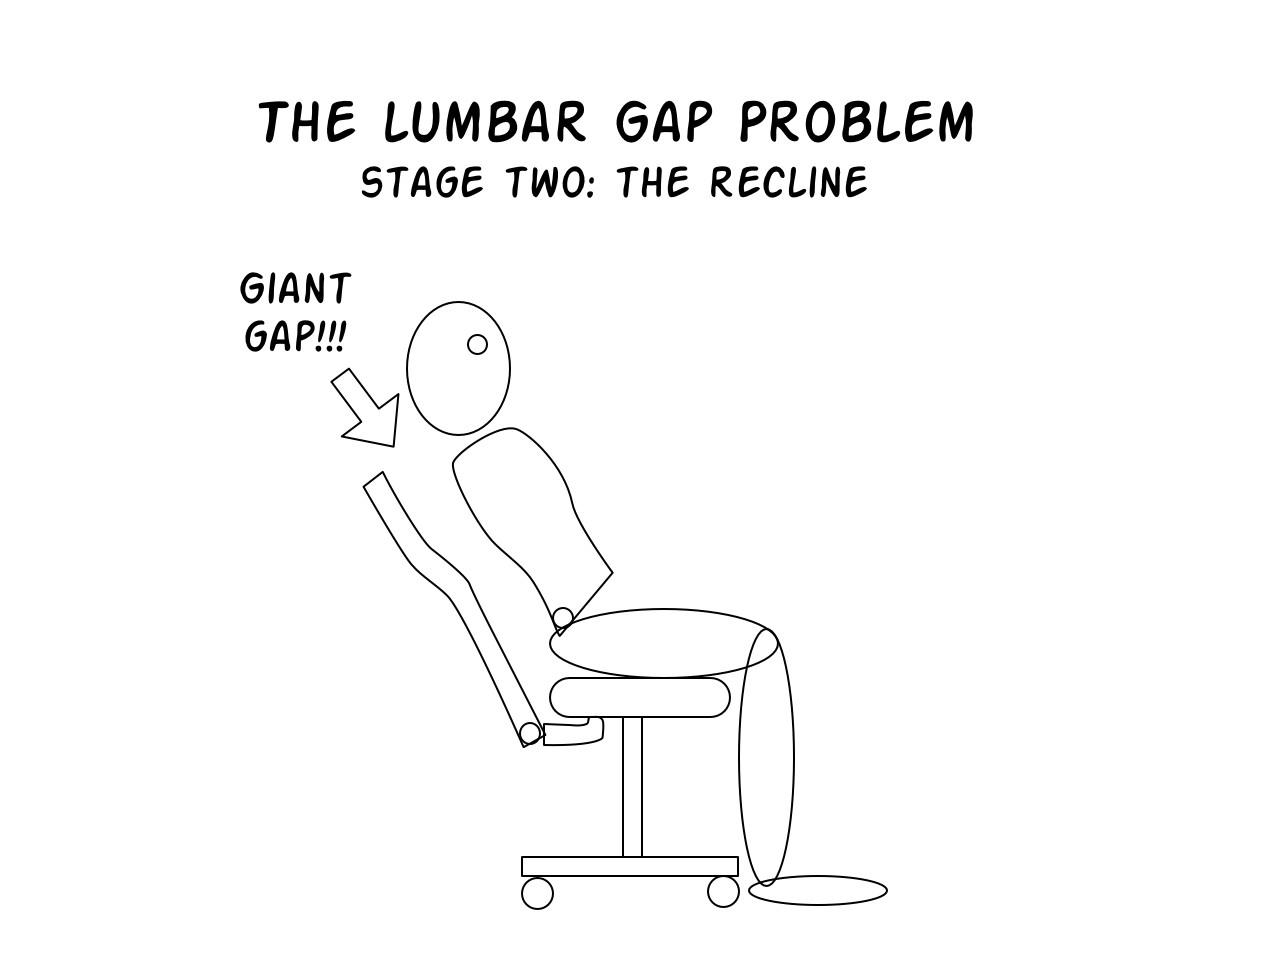 Lumbar Gap Problem stage 2